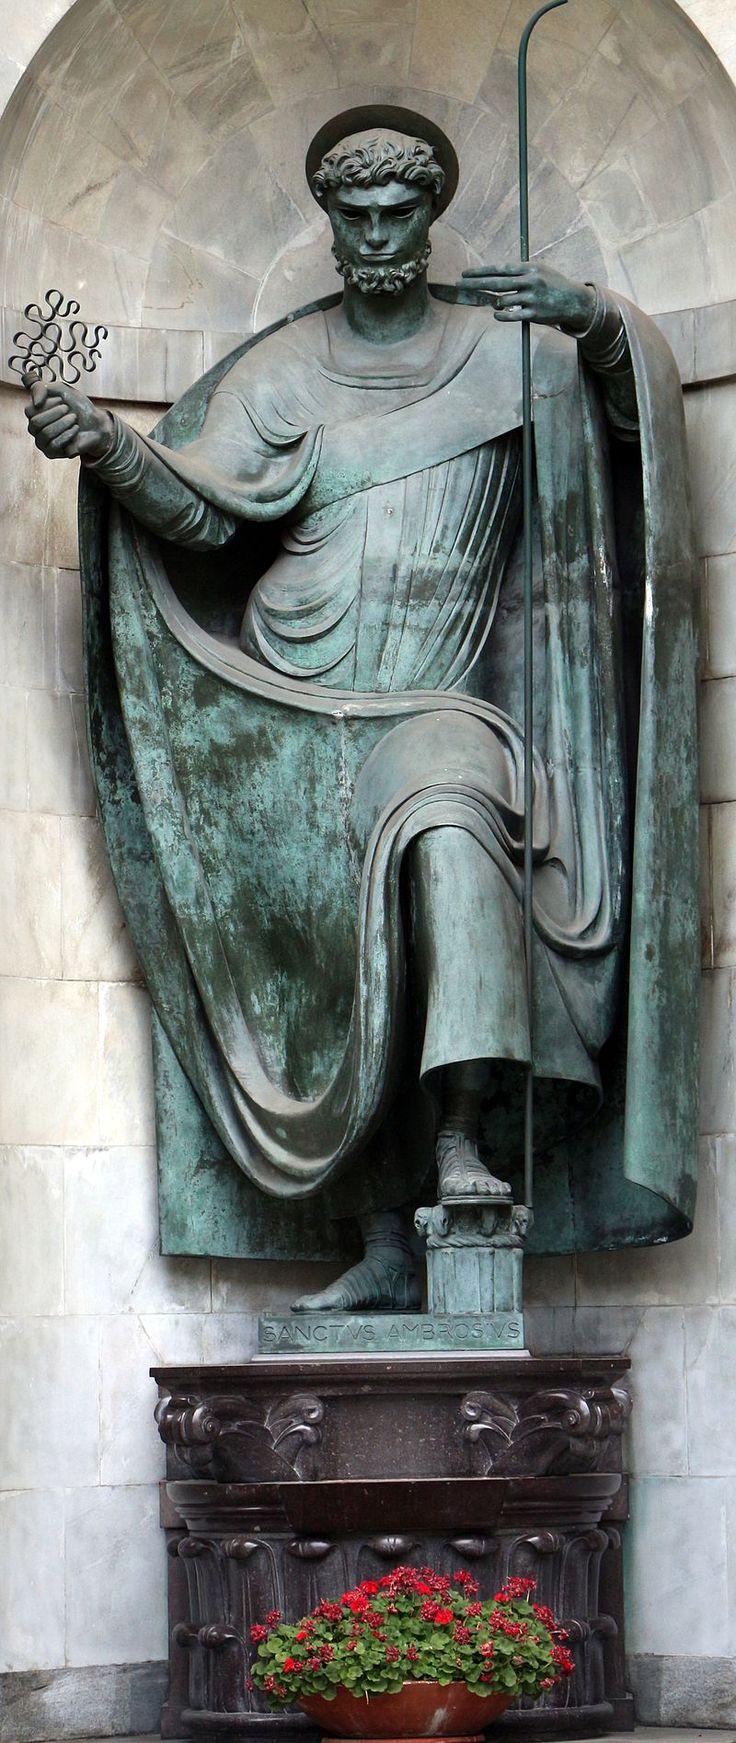 Adolfo wildt, sant'ambrogio che calpesta i vizi capitali, bronzo, 03 - Adolfo Wildt - Wikipedia